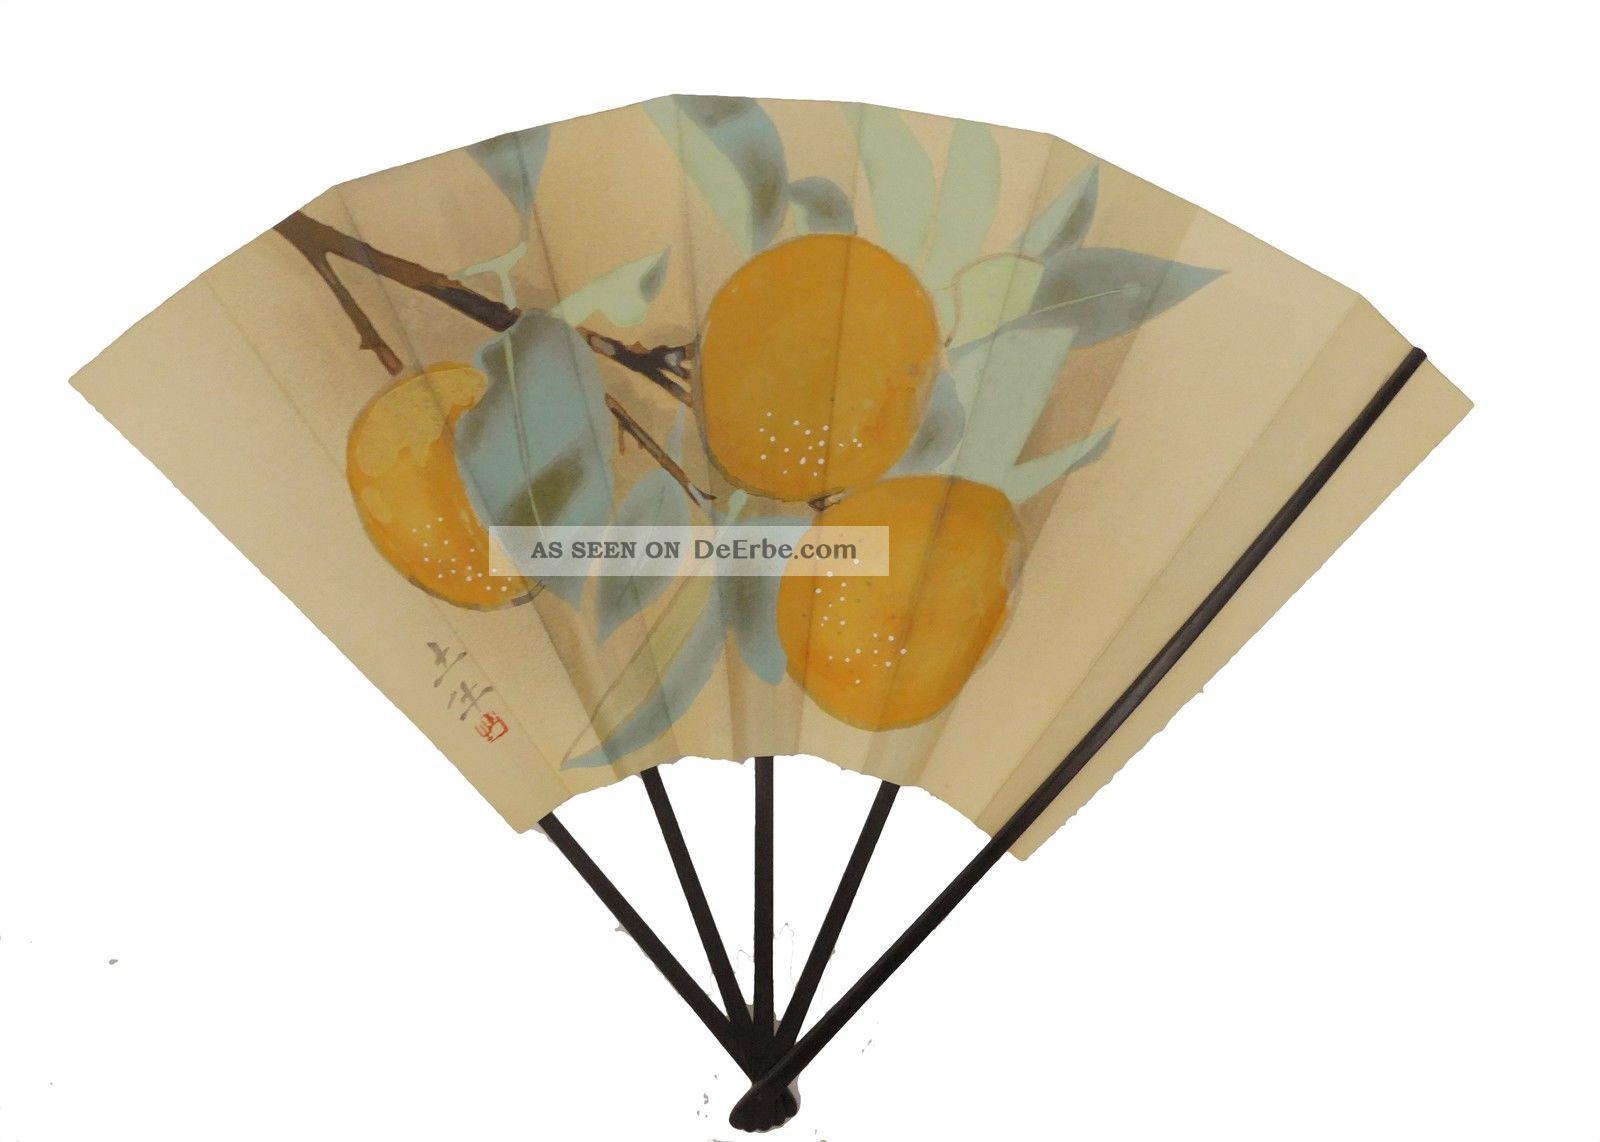 japanische alte habdgemalte gro e f cher f r dekoration gute. Black Bedroom Furniture Sets. Home Design Ideas